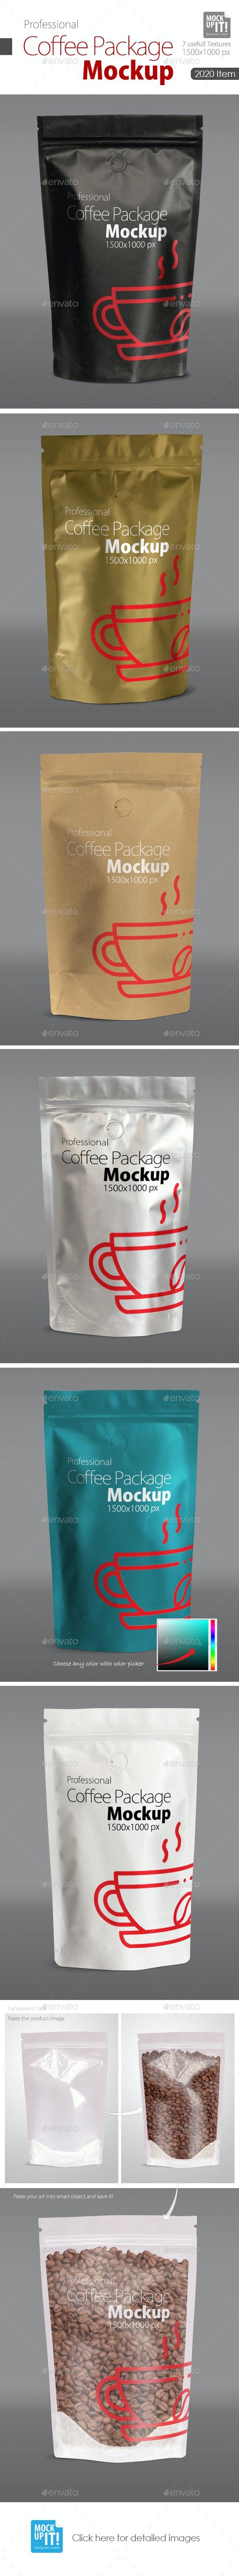 Coffee Package Mock up - Food and Drink Packaging